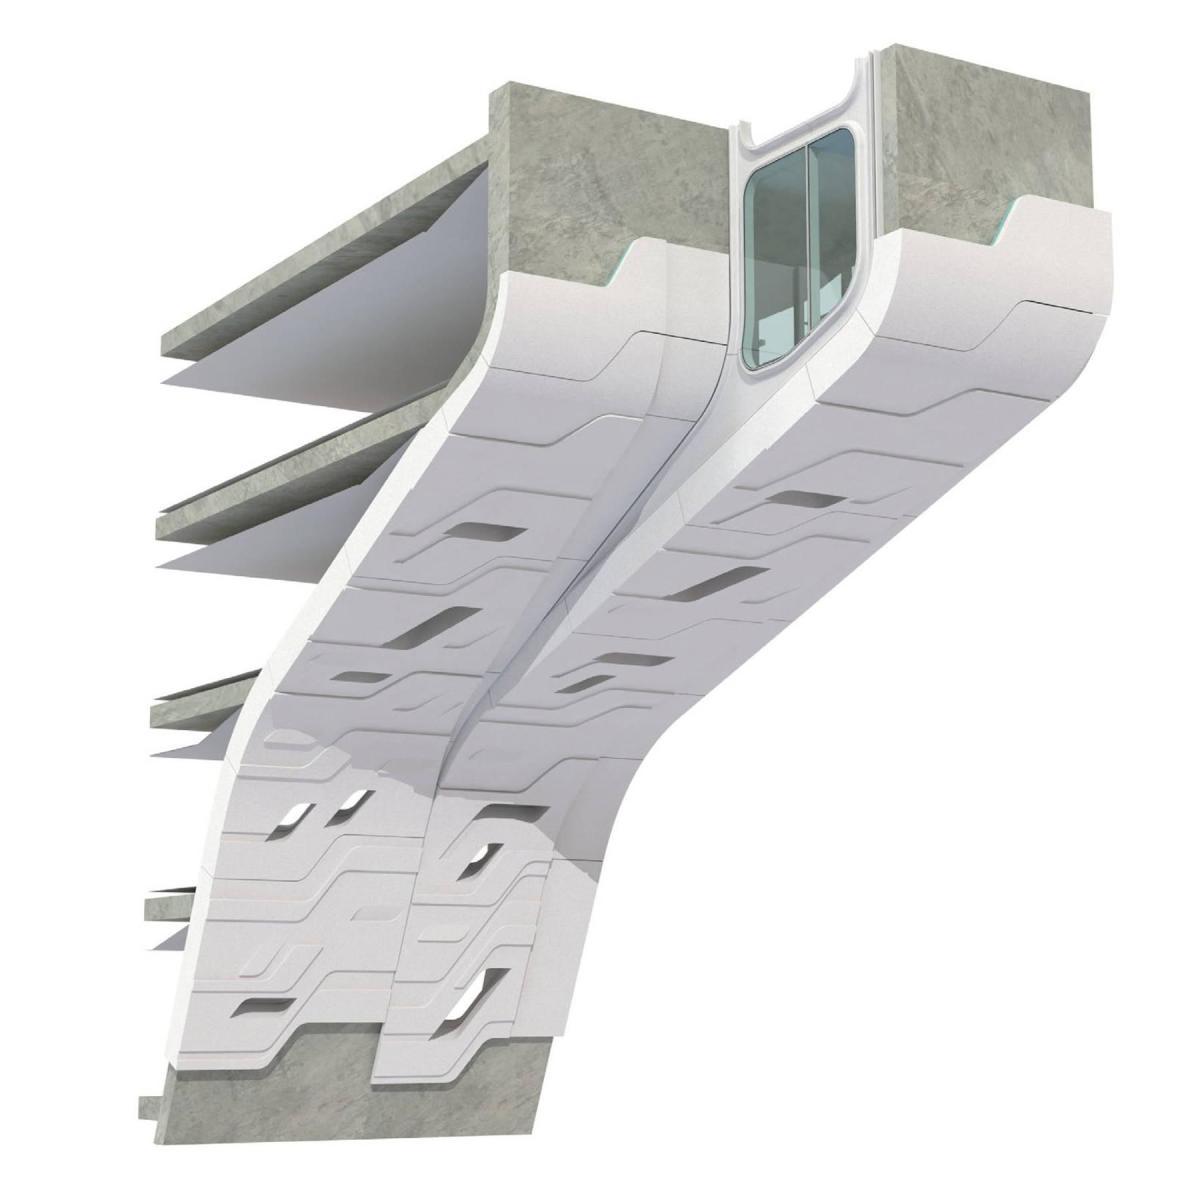 stone-towers_zaha-hadid-architects-details